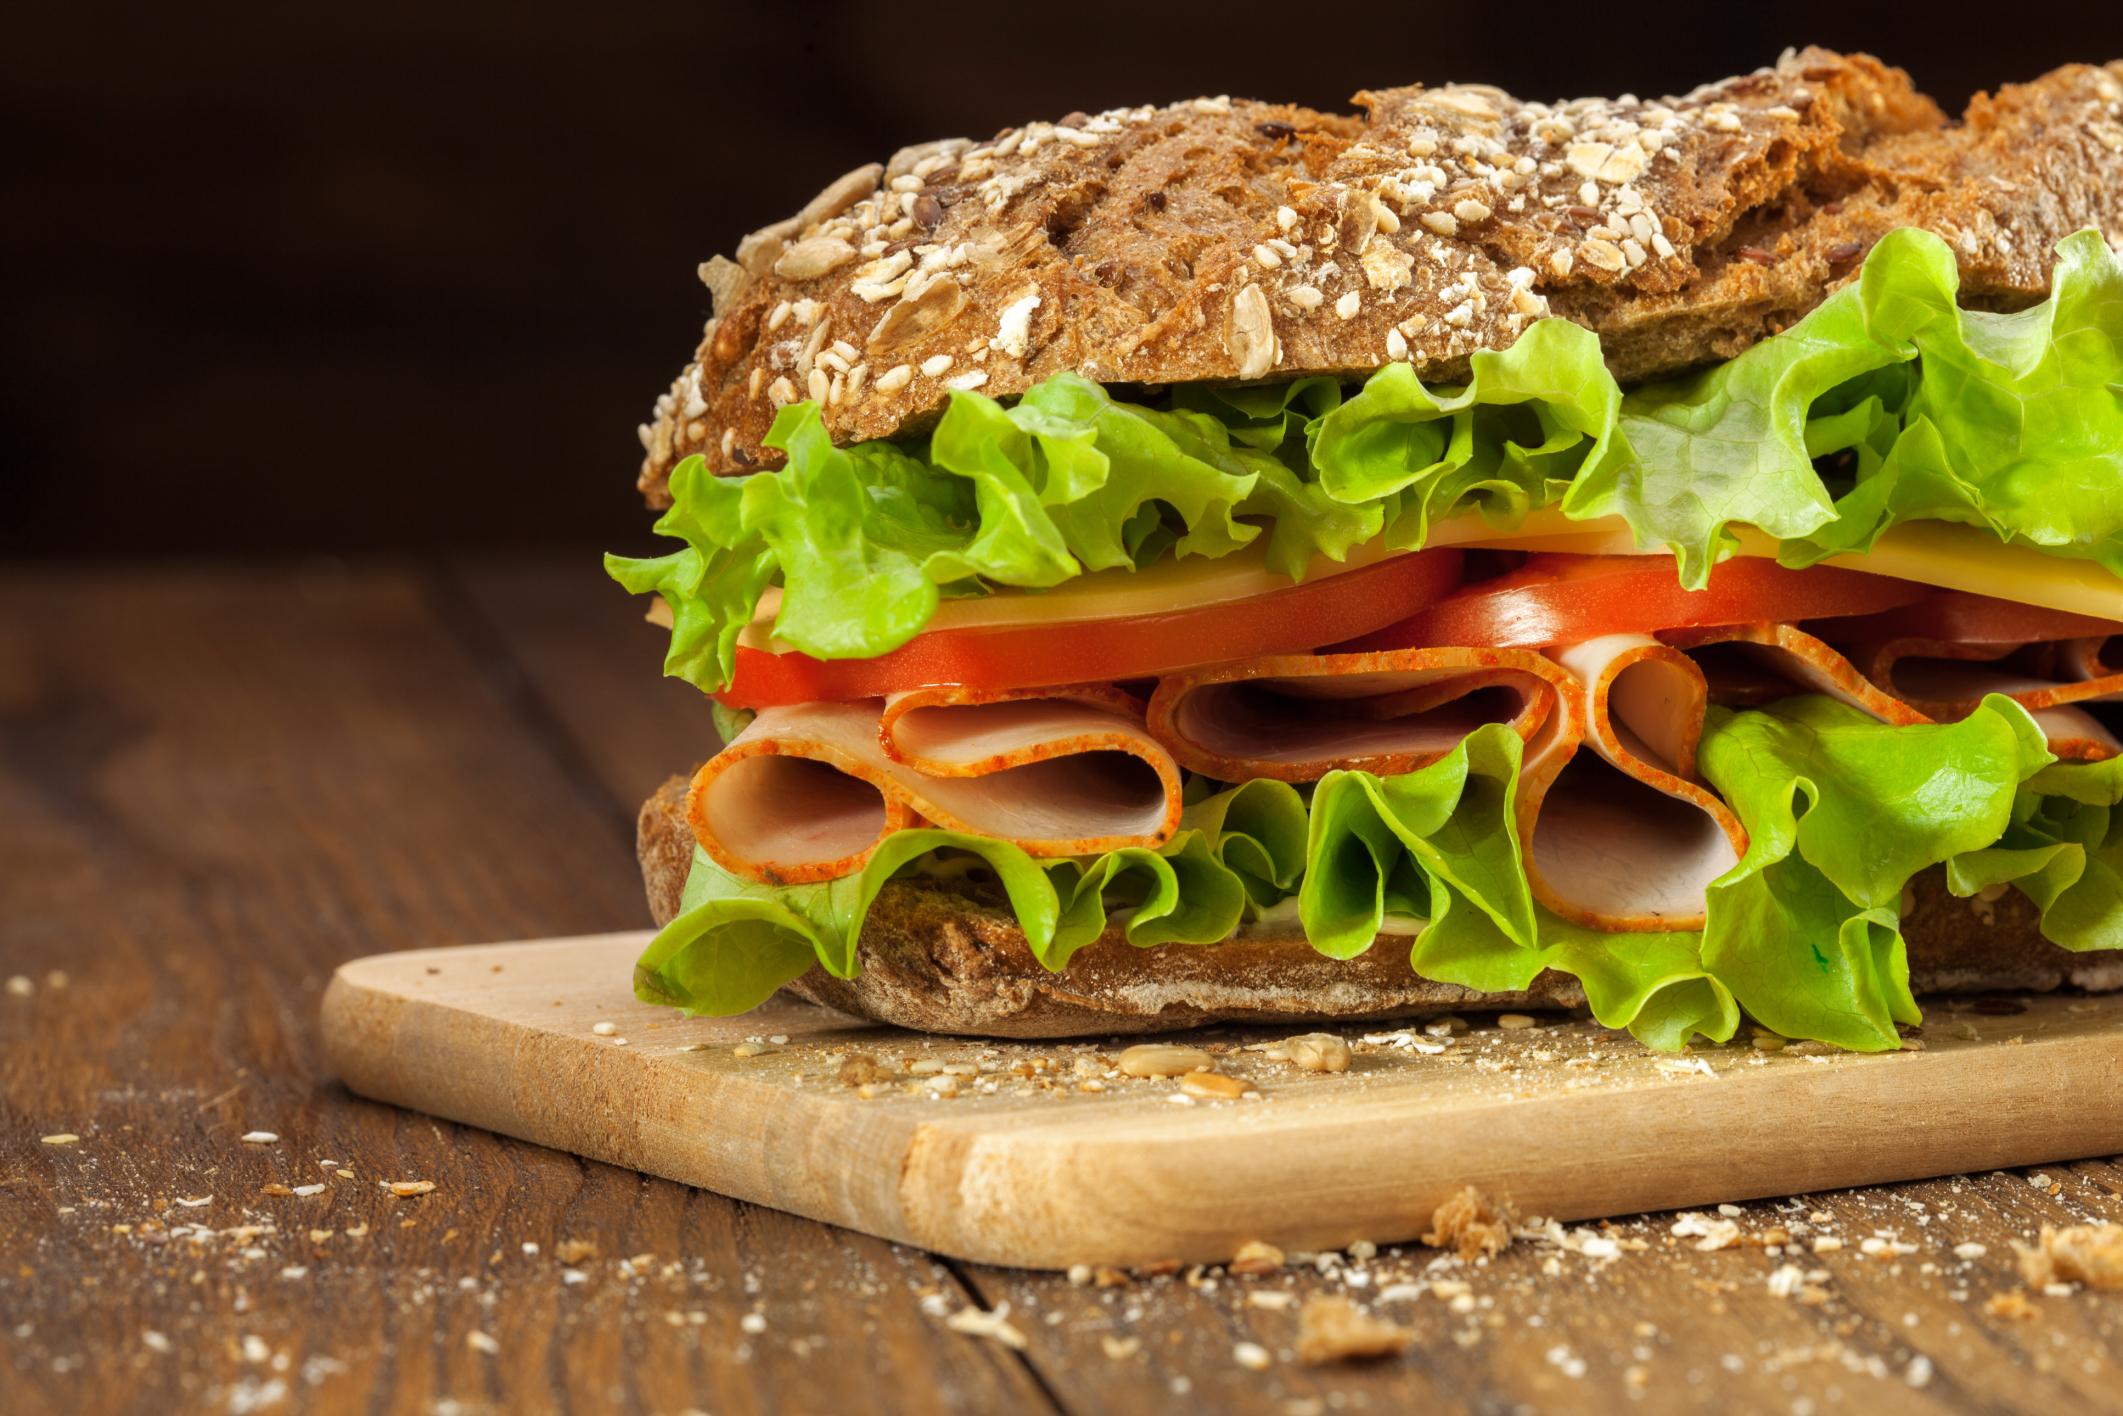 Subway 6 Inch Ham & Cheese on Wheat Bread